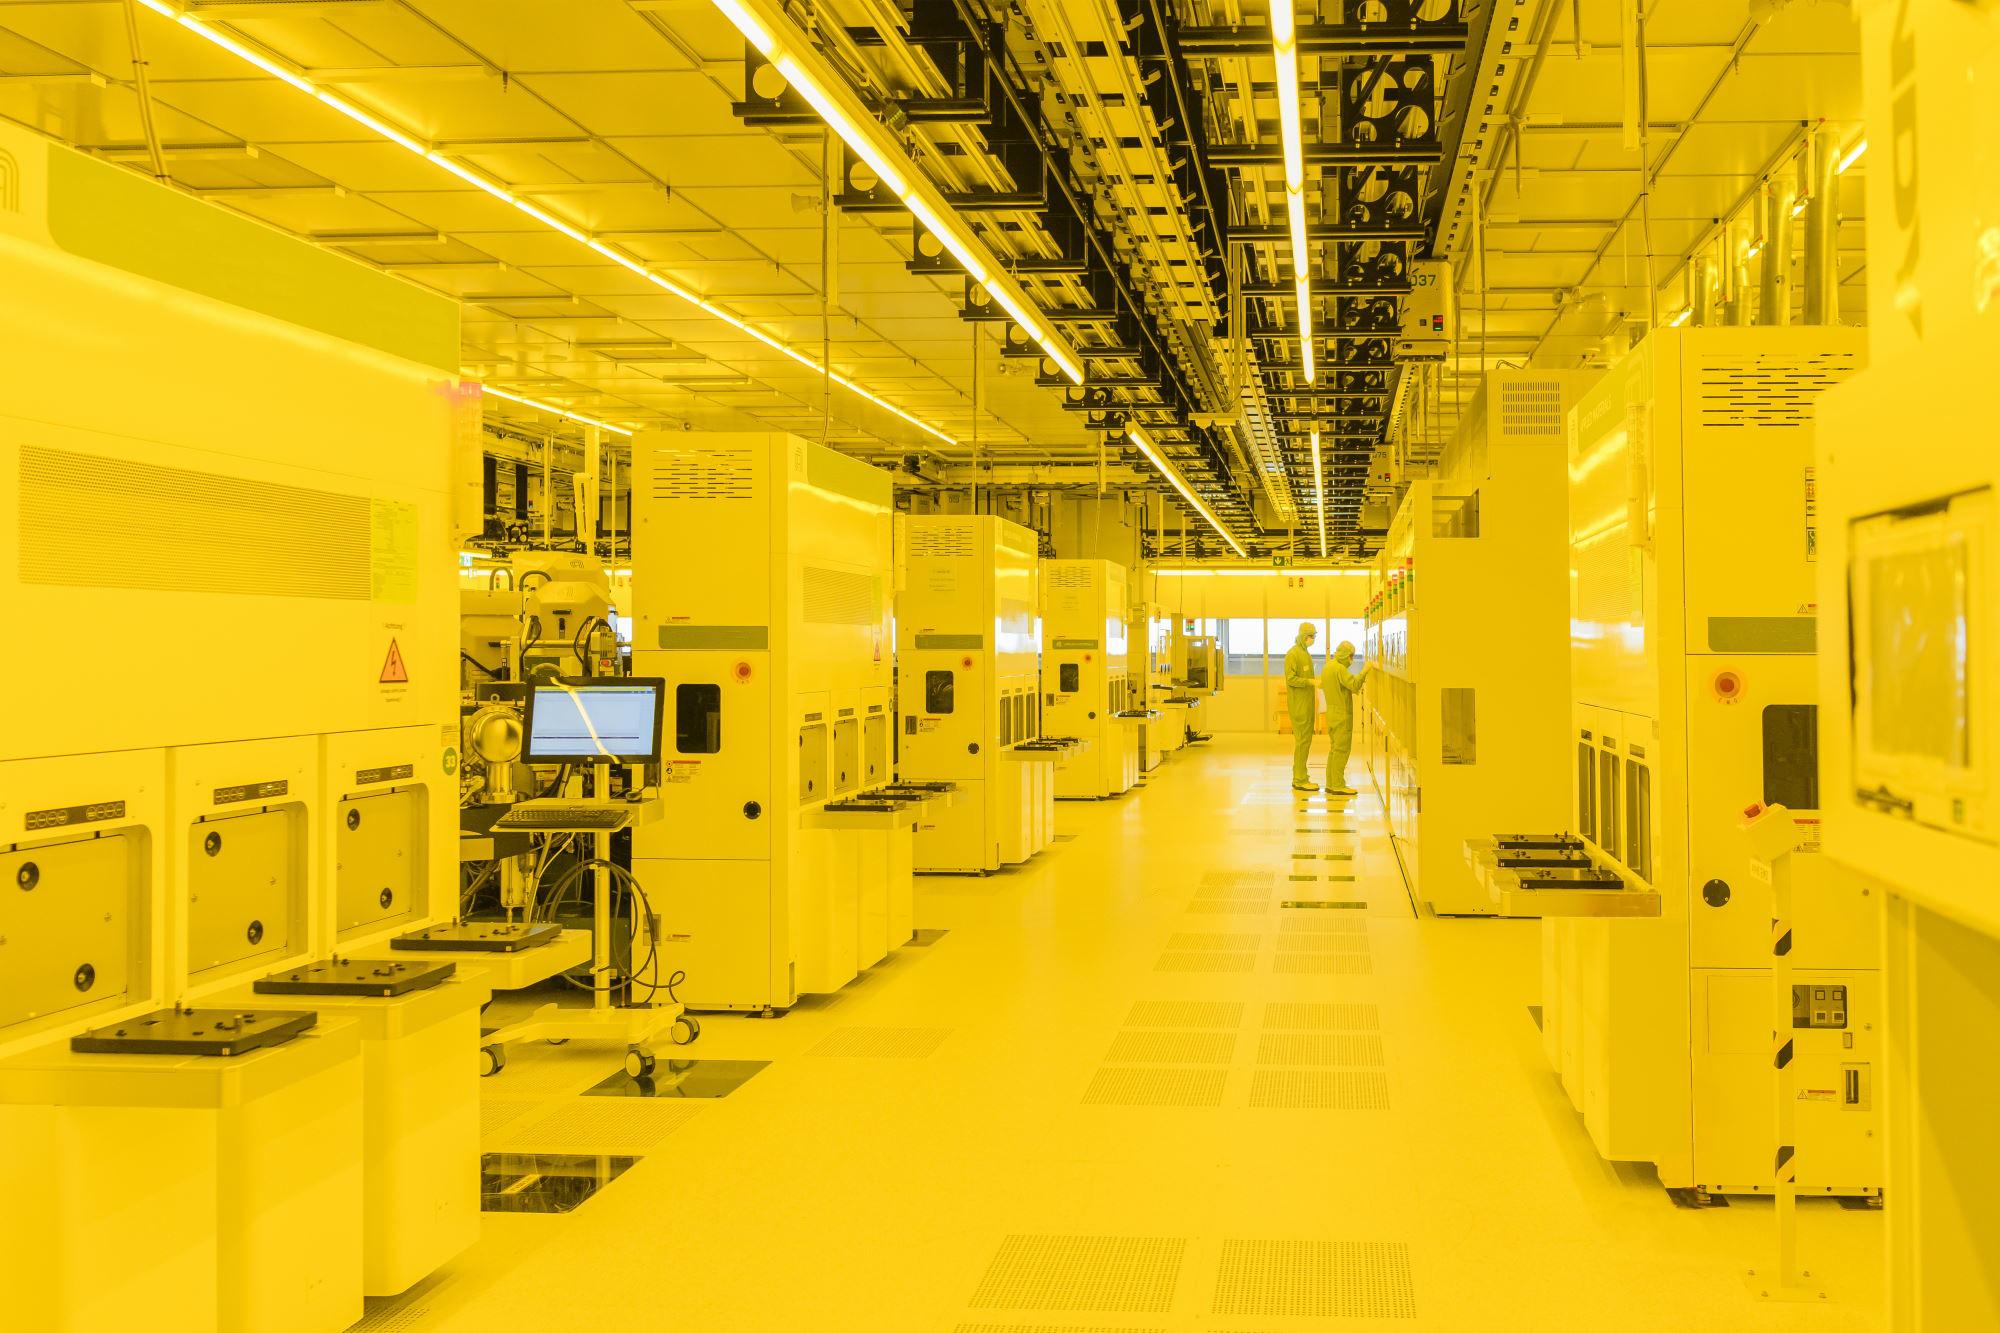 Výroba polovodičů Bosch v Drážďanech